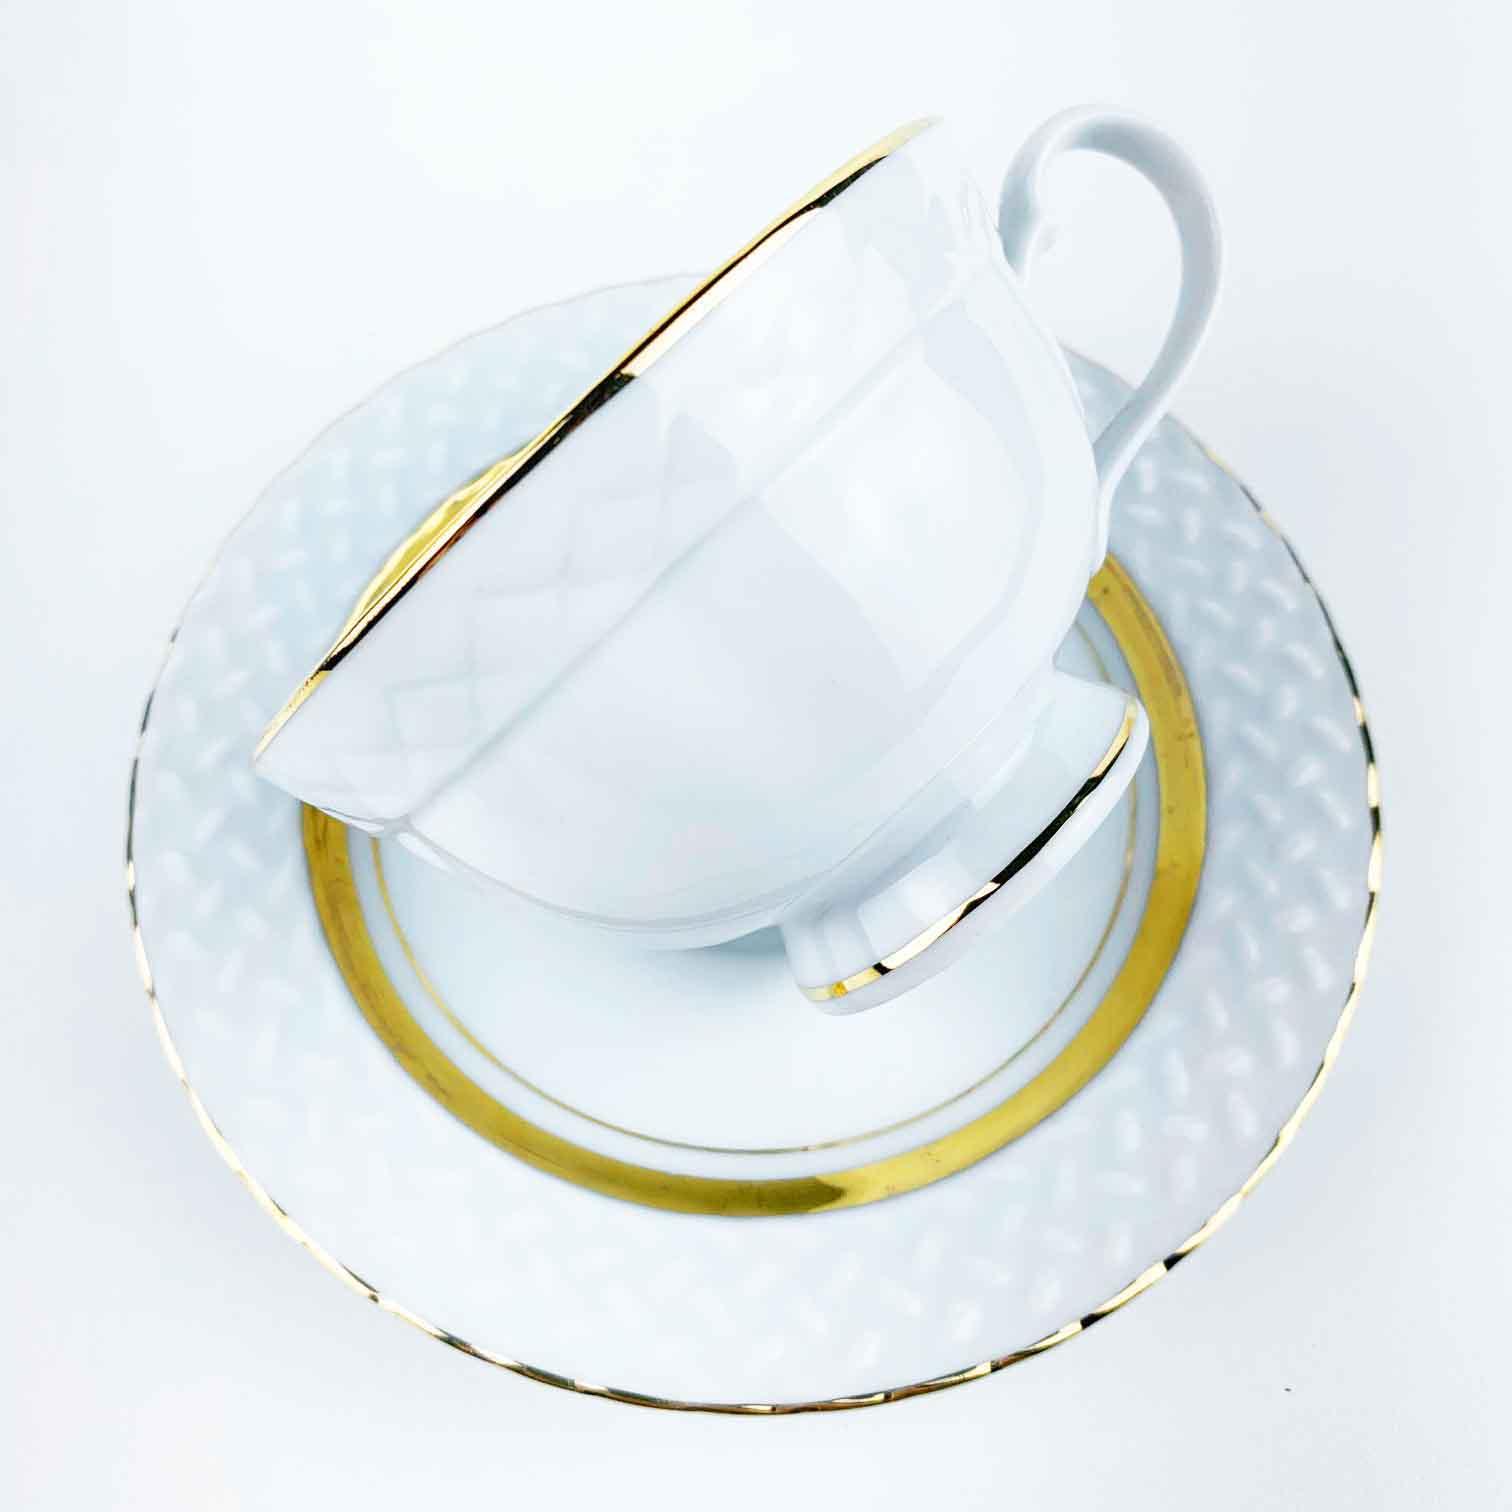 Xícara de Chá Queen Porcelana c/Filetes Ouro